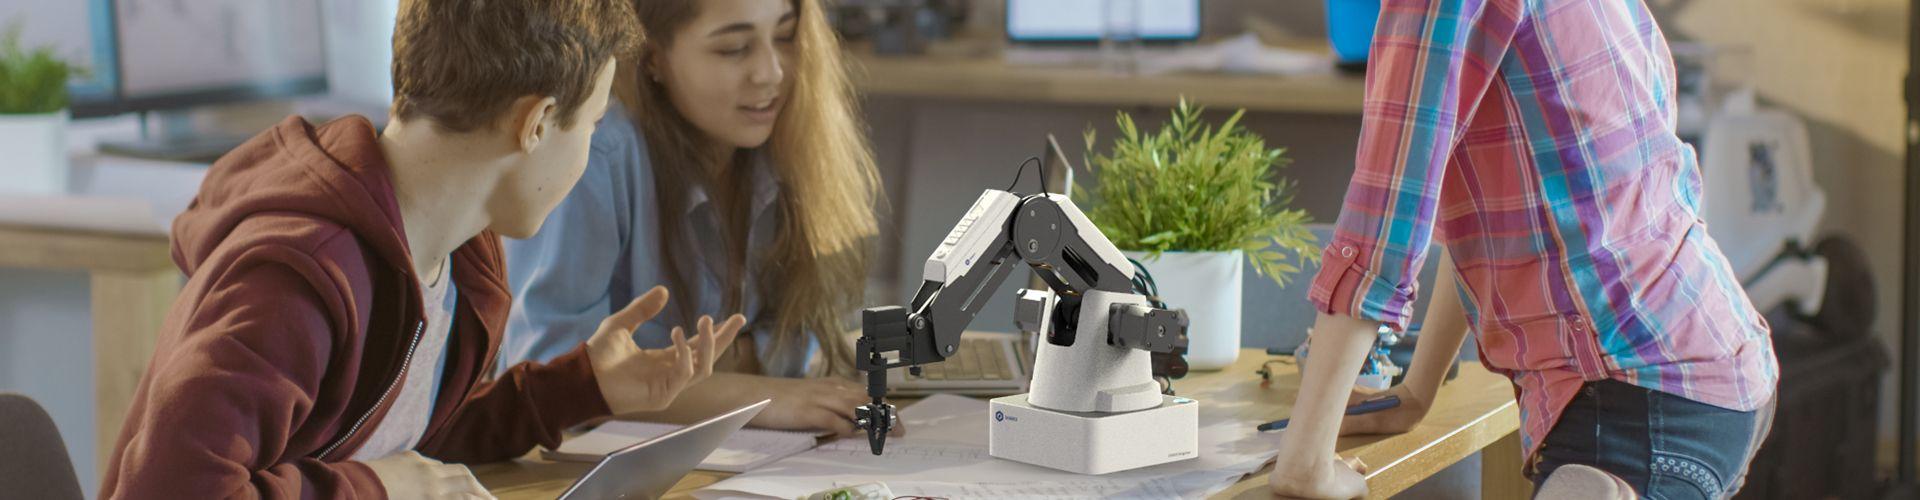 SAAB RDS Robotic Arms